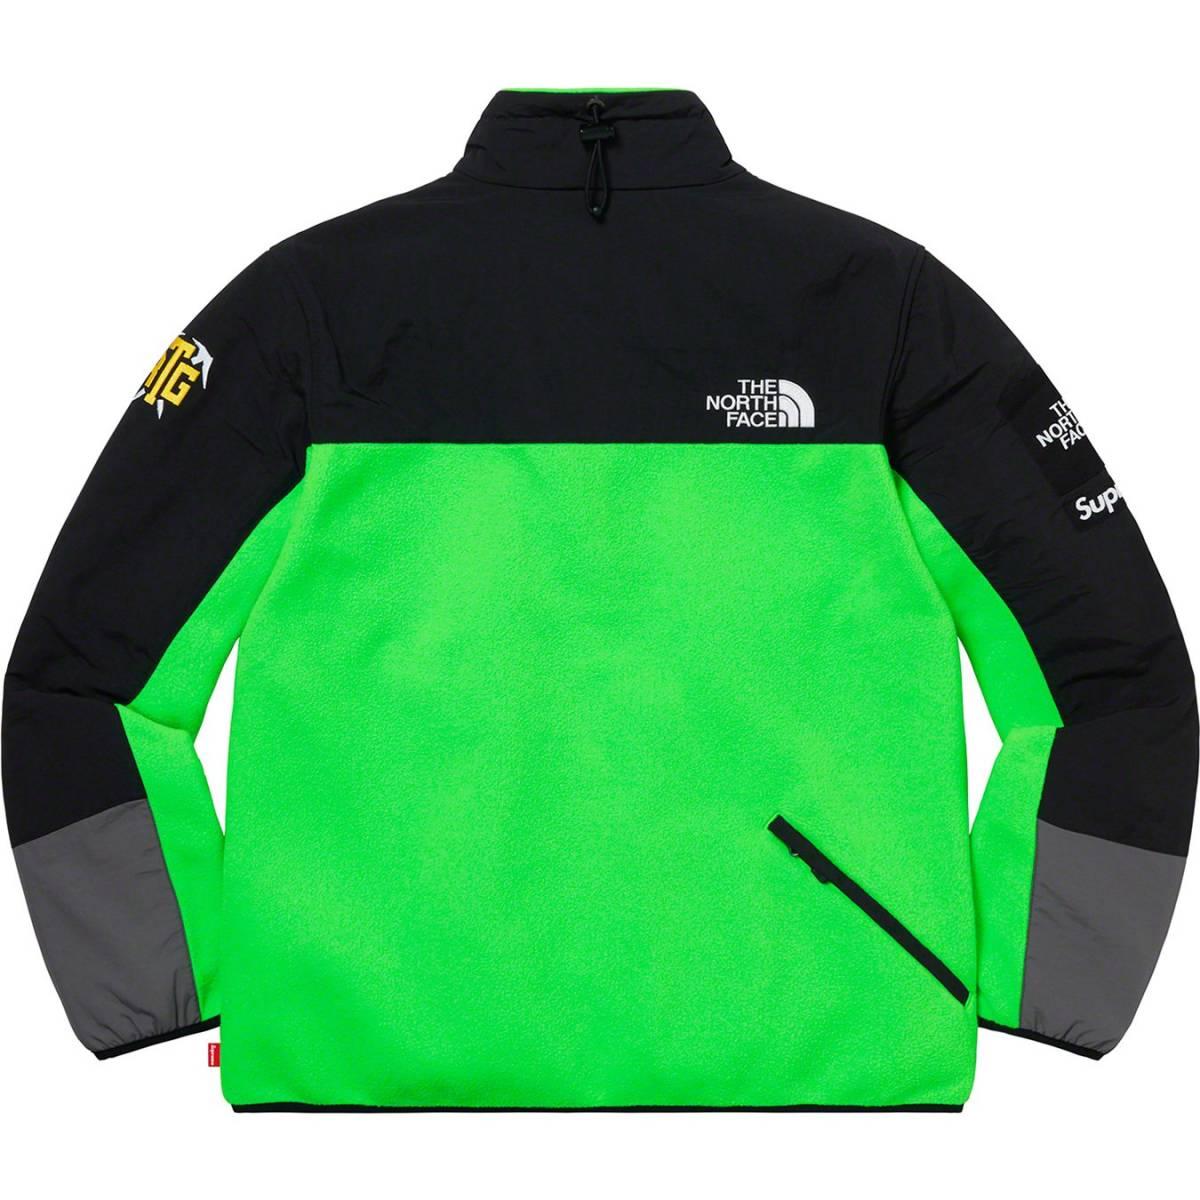 Supreme The North Face RTG Fleece Jacket 緑 BrightGreen Sサイズ 国内正規購入 タグ有 シュプリーム ノースフェイス フリースジャケット_画像6